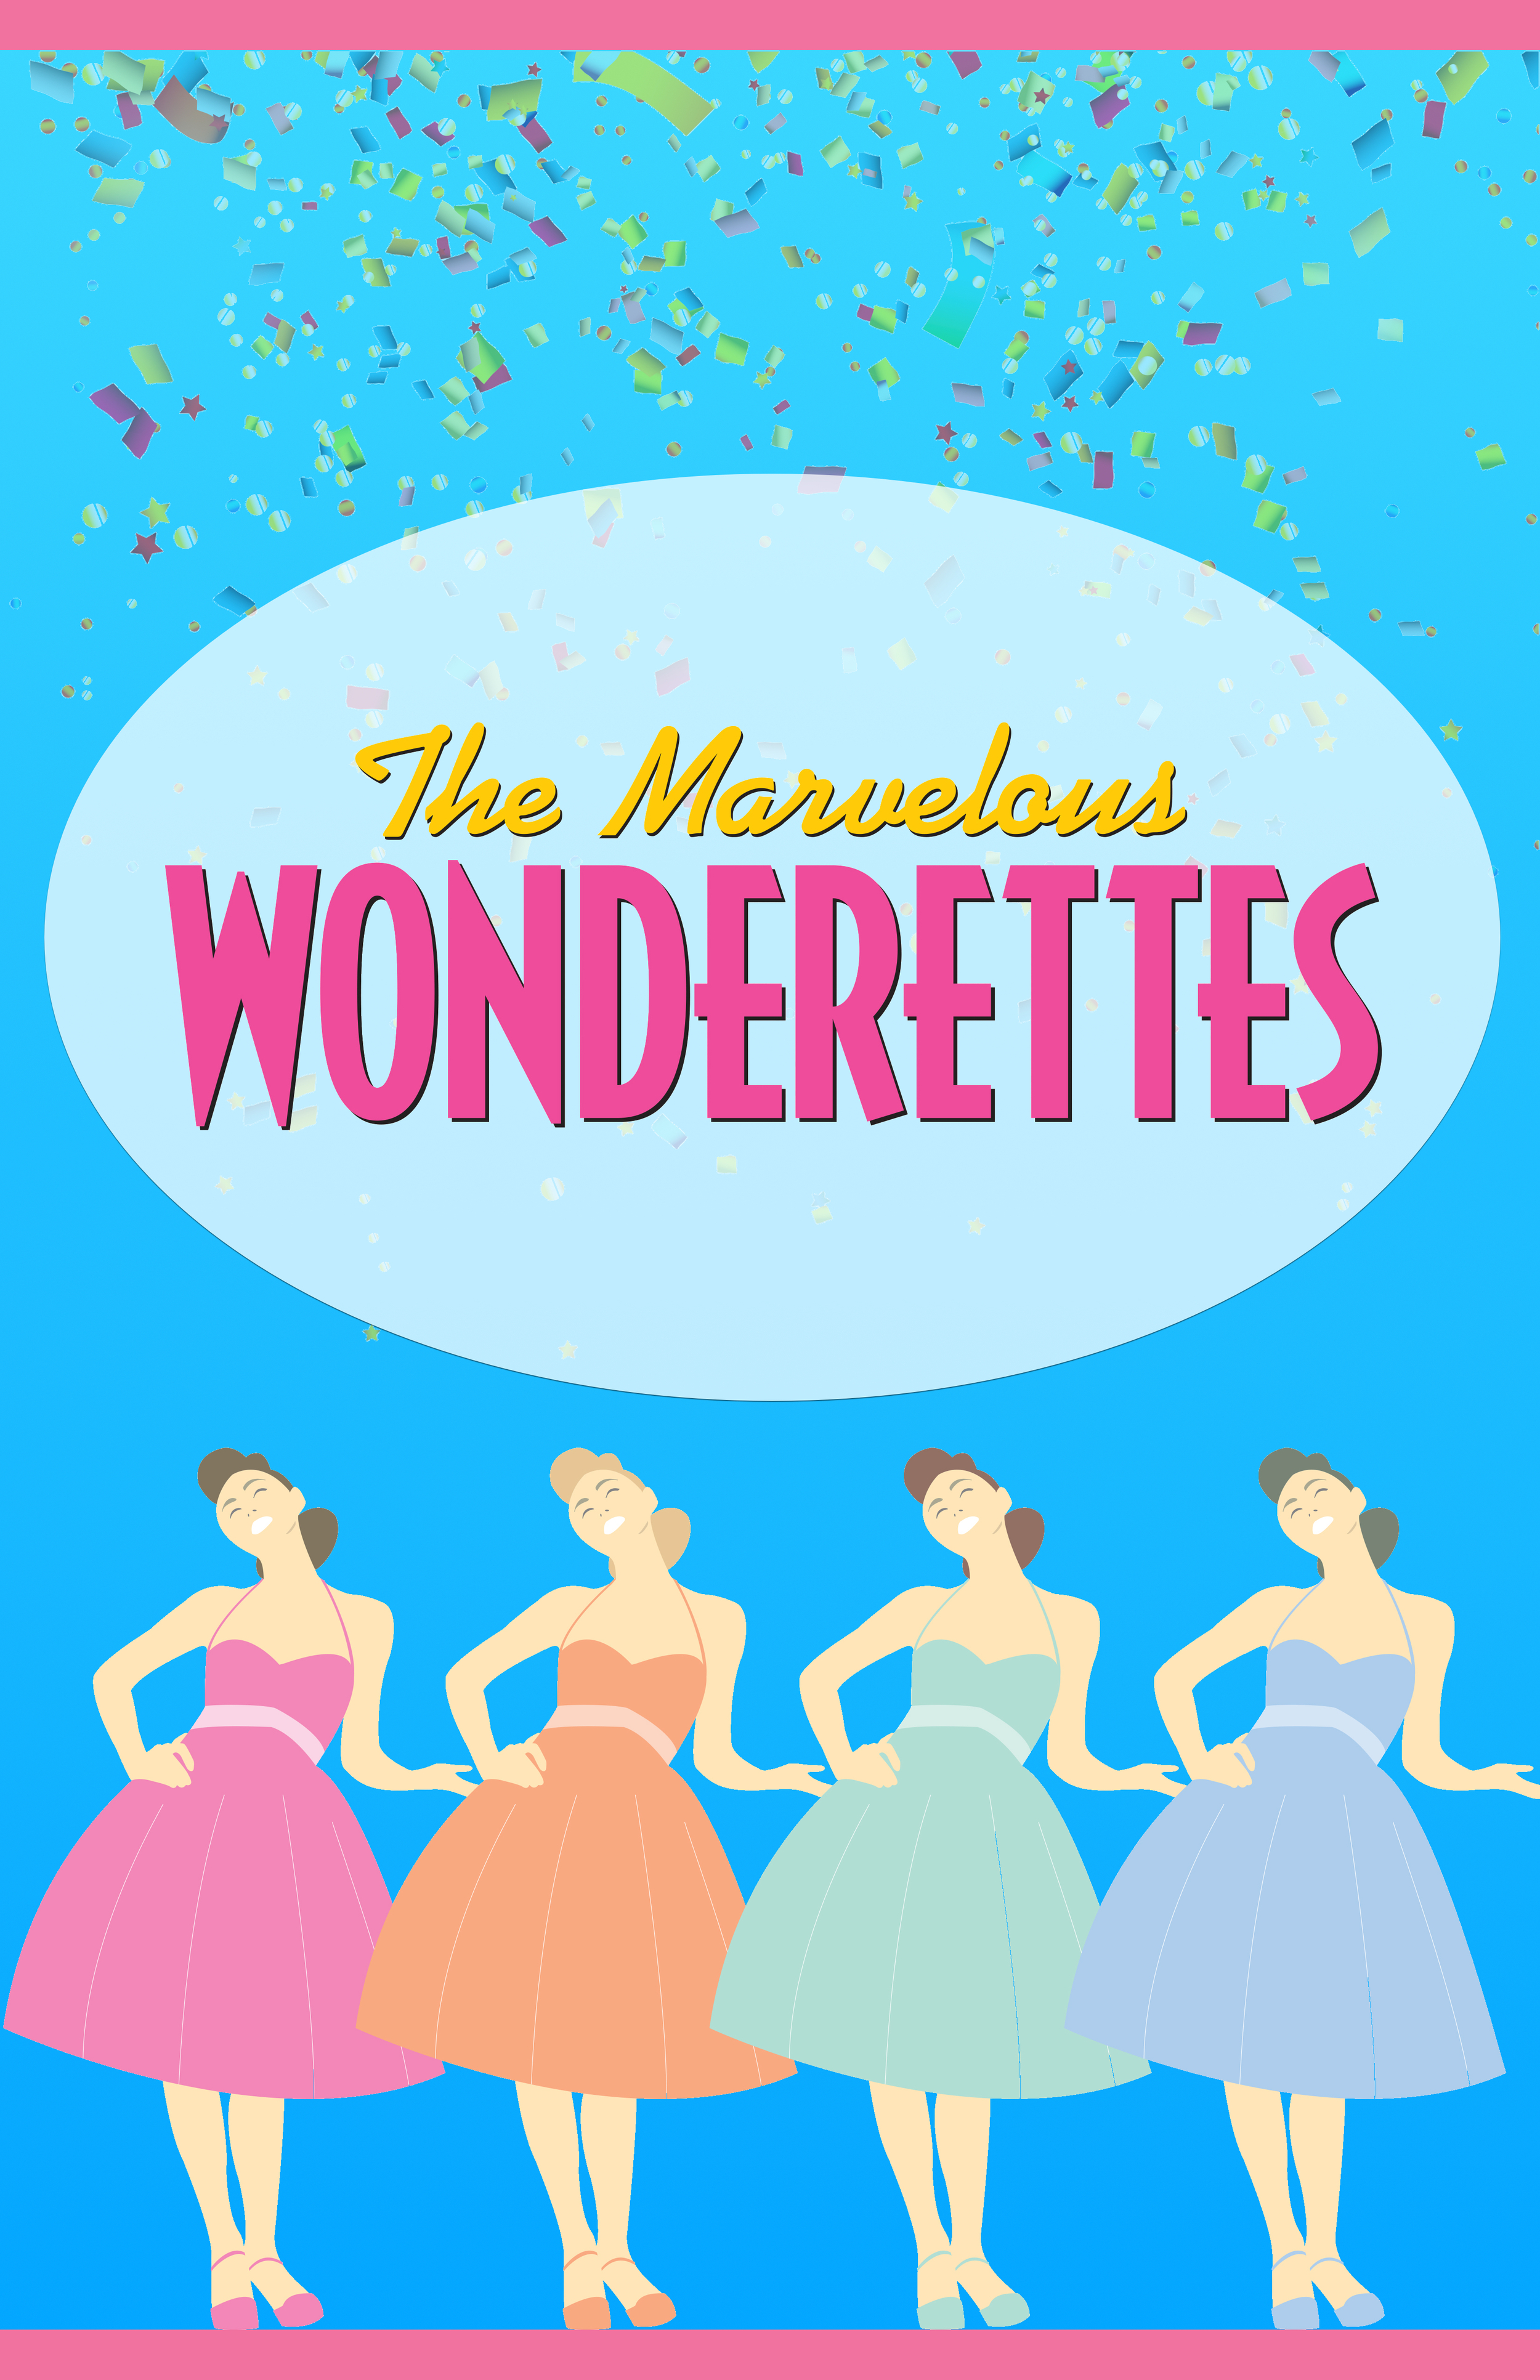 Wonderettes Art Long.jpg